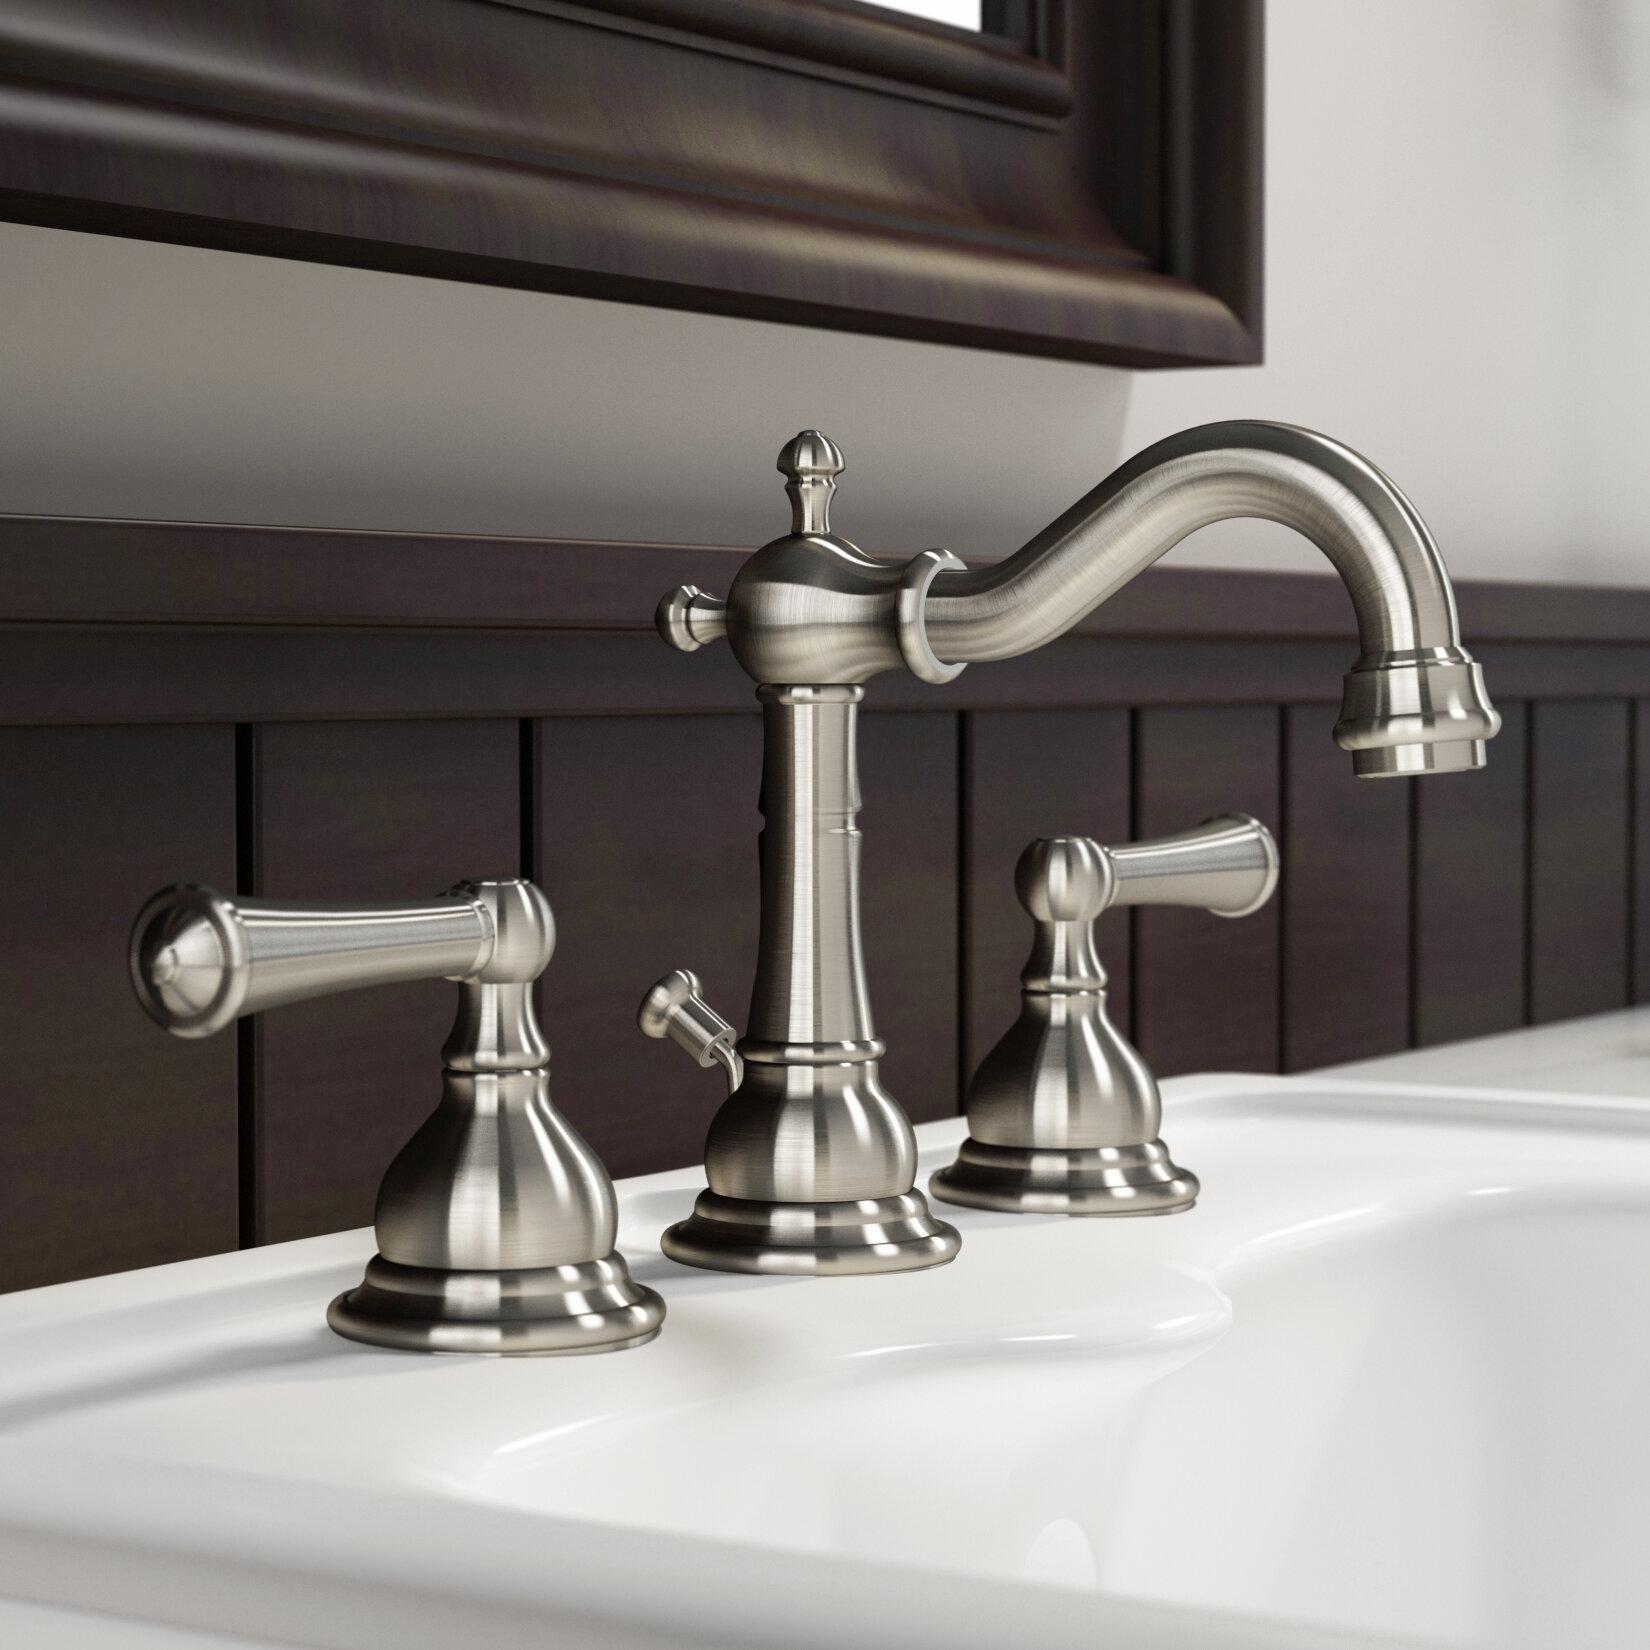 Jacuzzi® Barrea Lavatory Widespread Bathroom Faucet with Drain ...